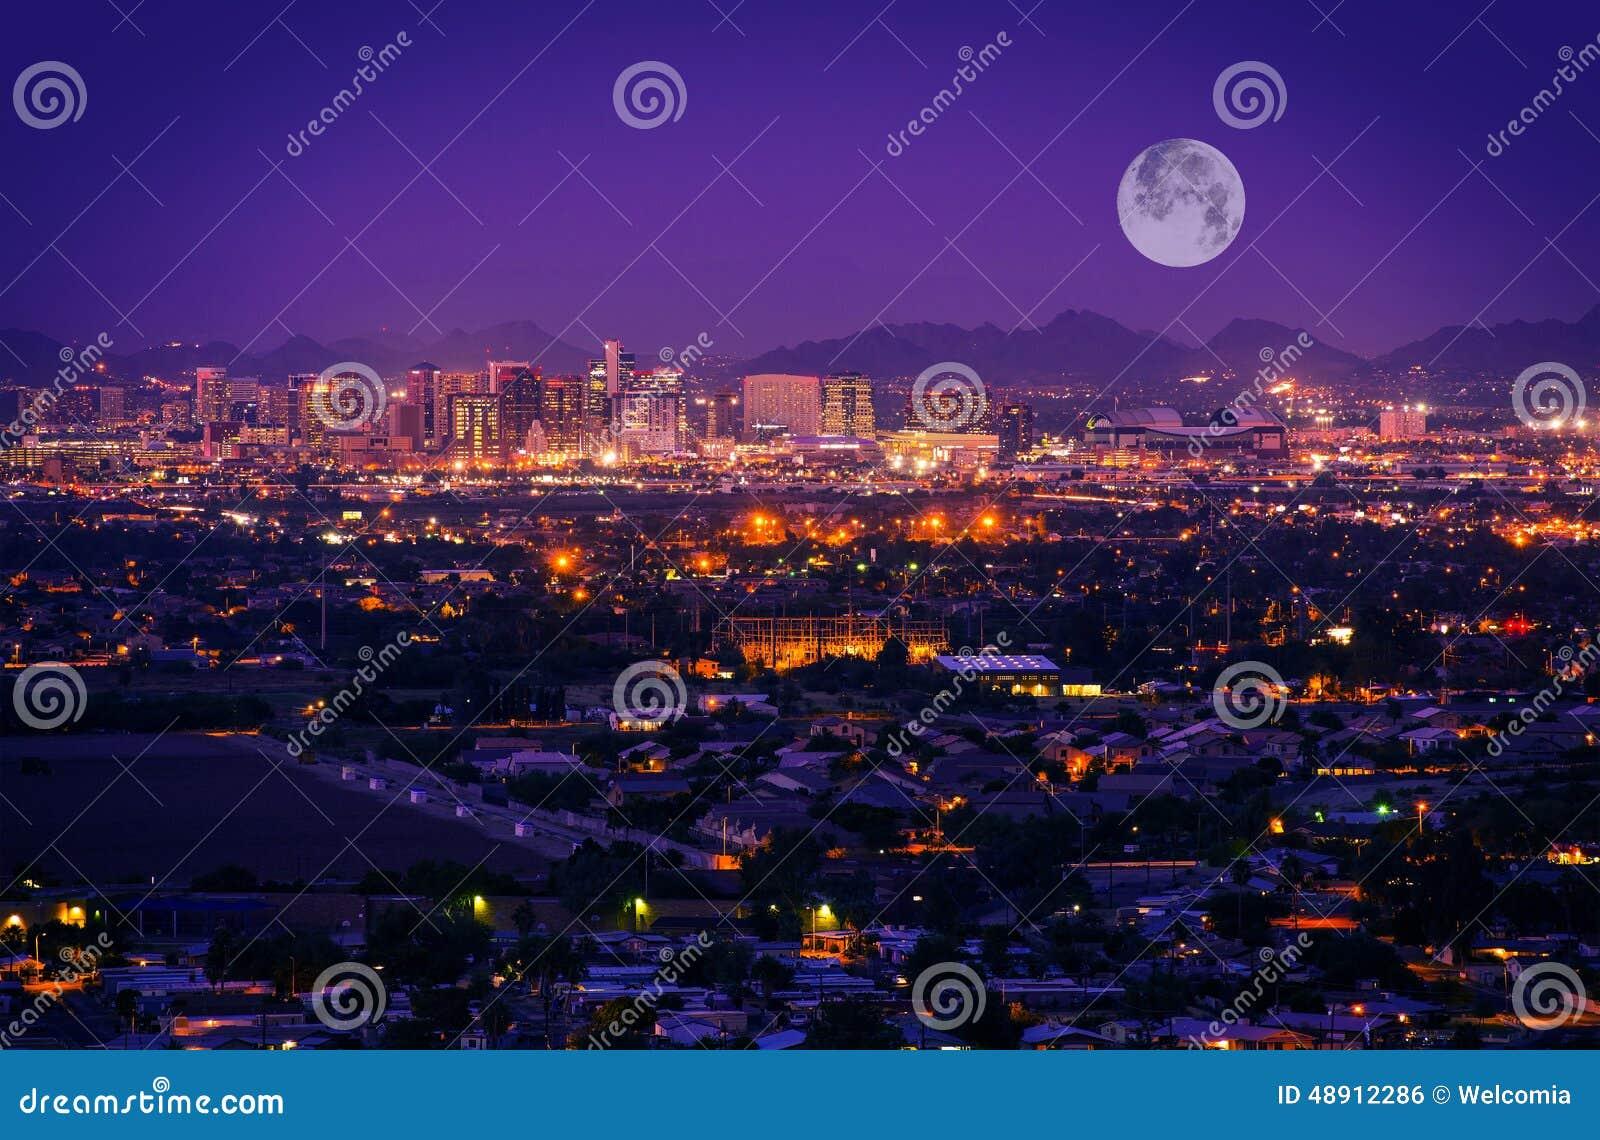 Download Phoenix Arizona Skyline stock photo. Image of illuminated - 48912286